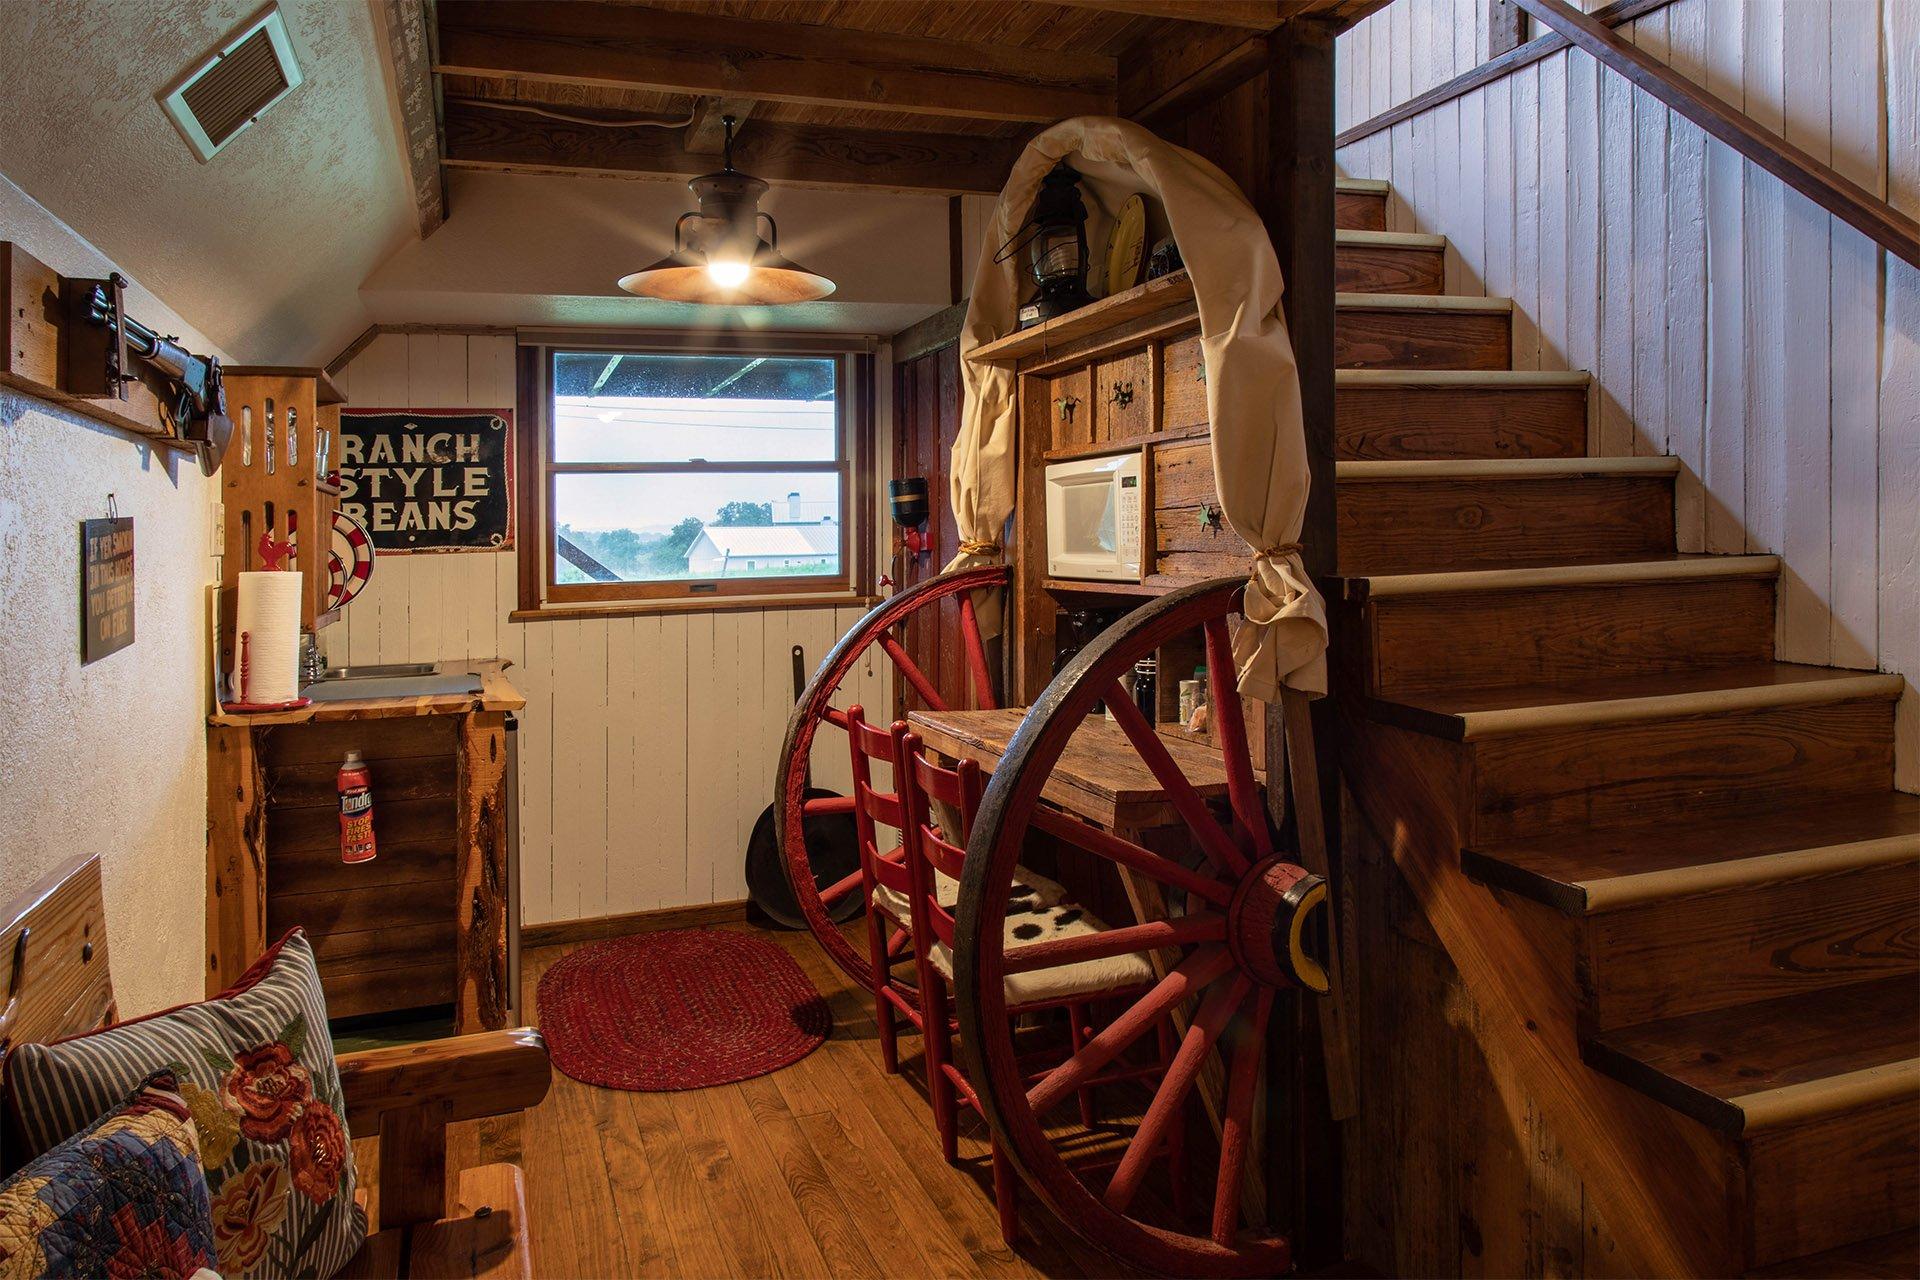 Larry Bill's Chuckwagon - Chuckwagon Inn | Fredericksburg